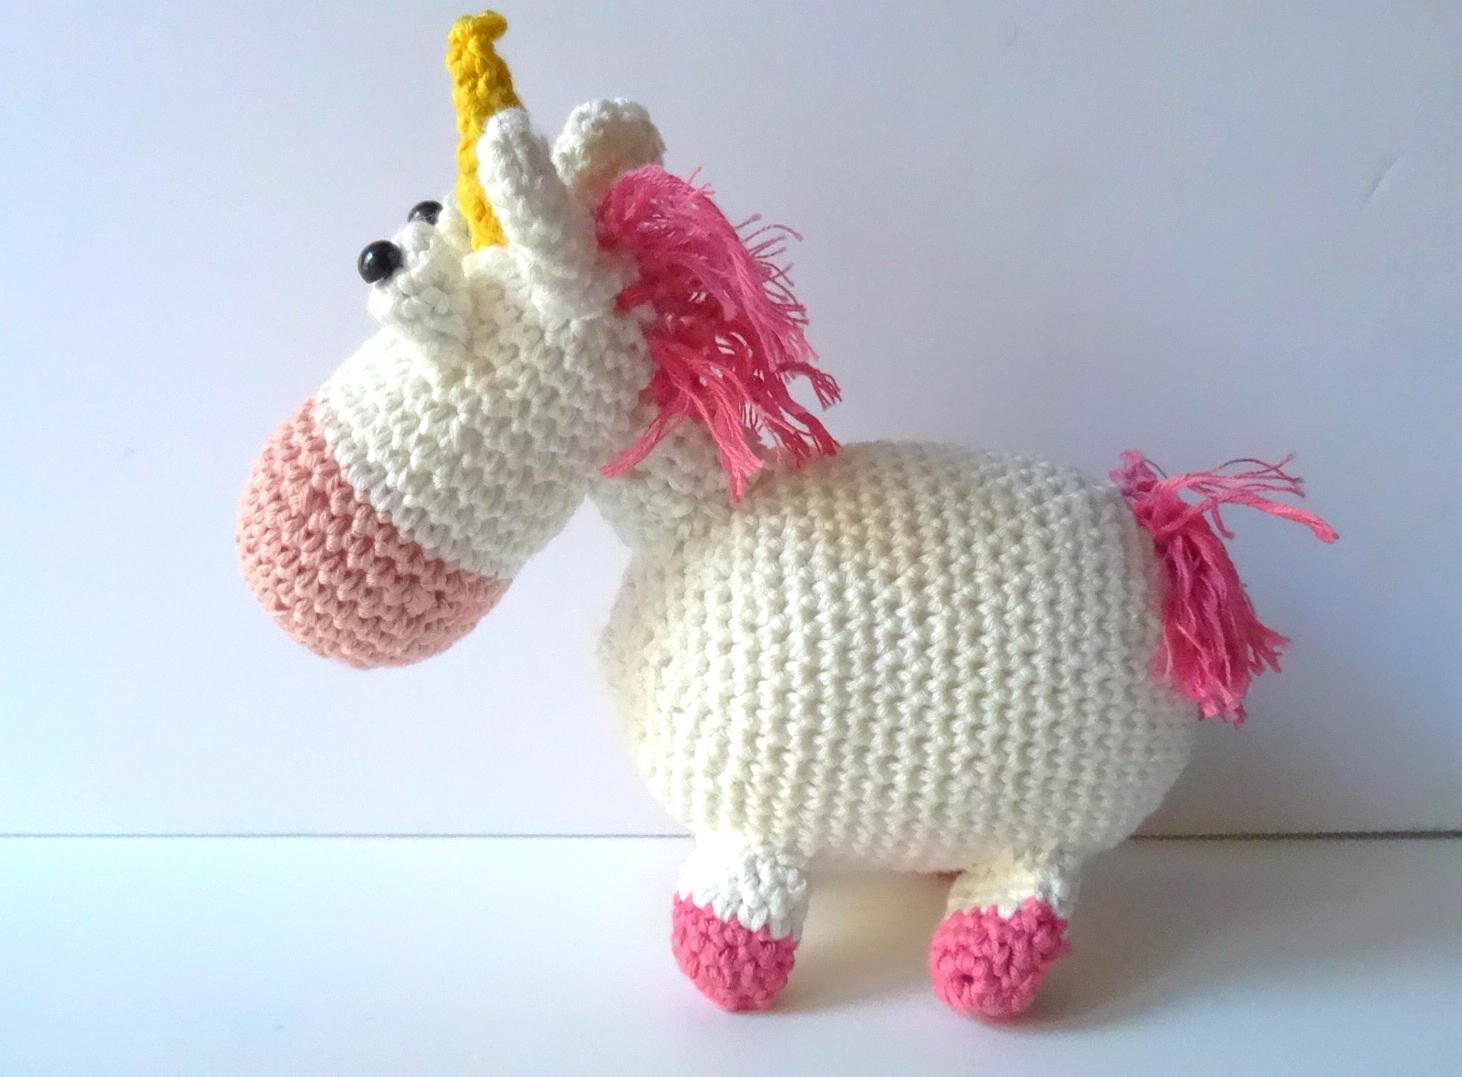 Amigurumi Unicornio Mi Villano Favorito : UNICORNIO DE GRU, MI VILLANO FAVORITO